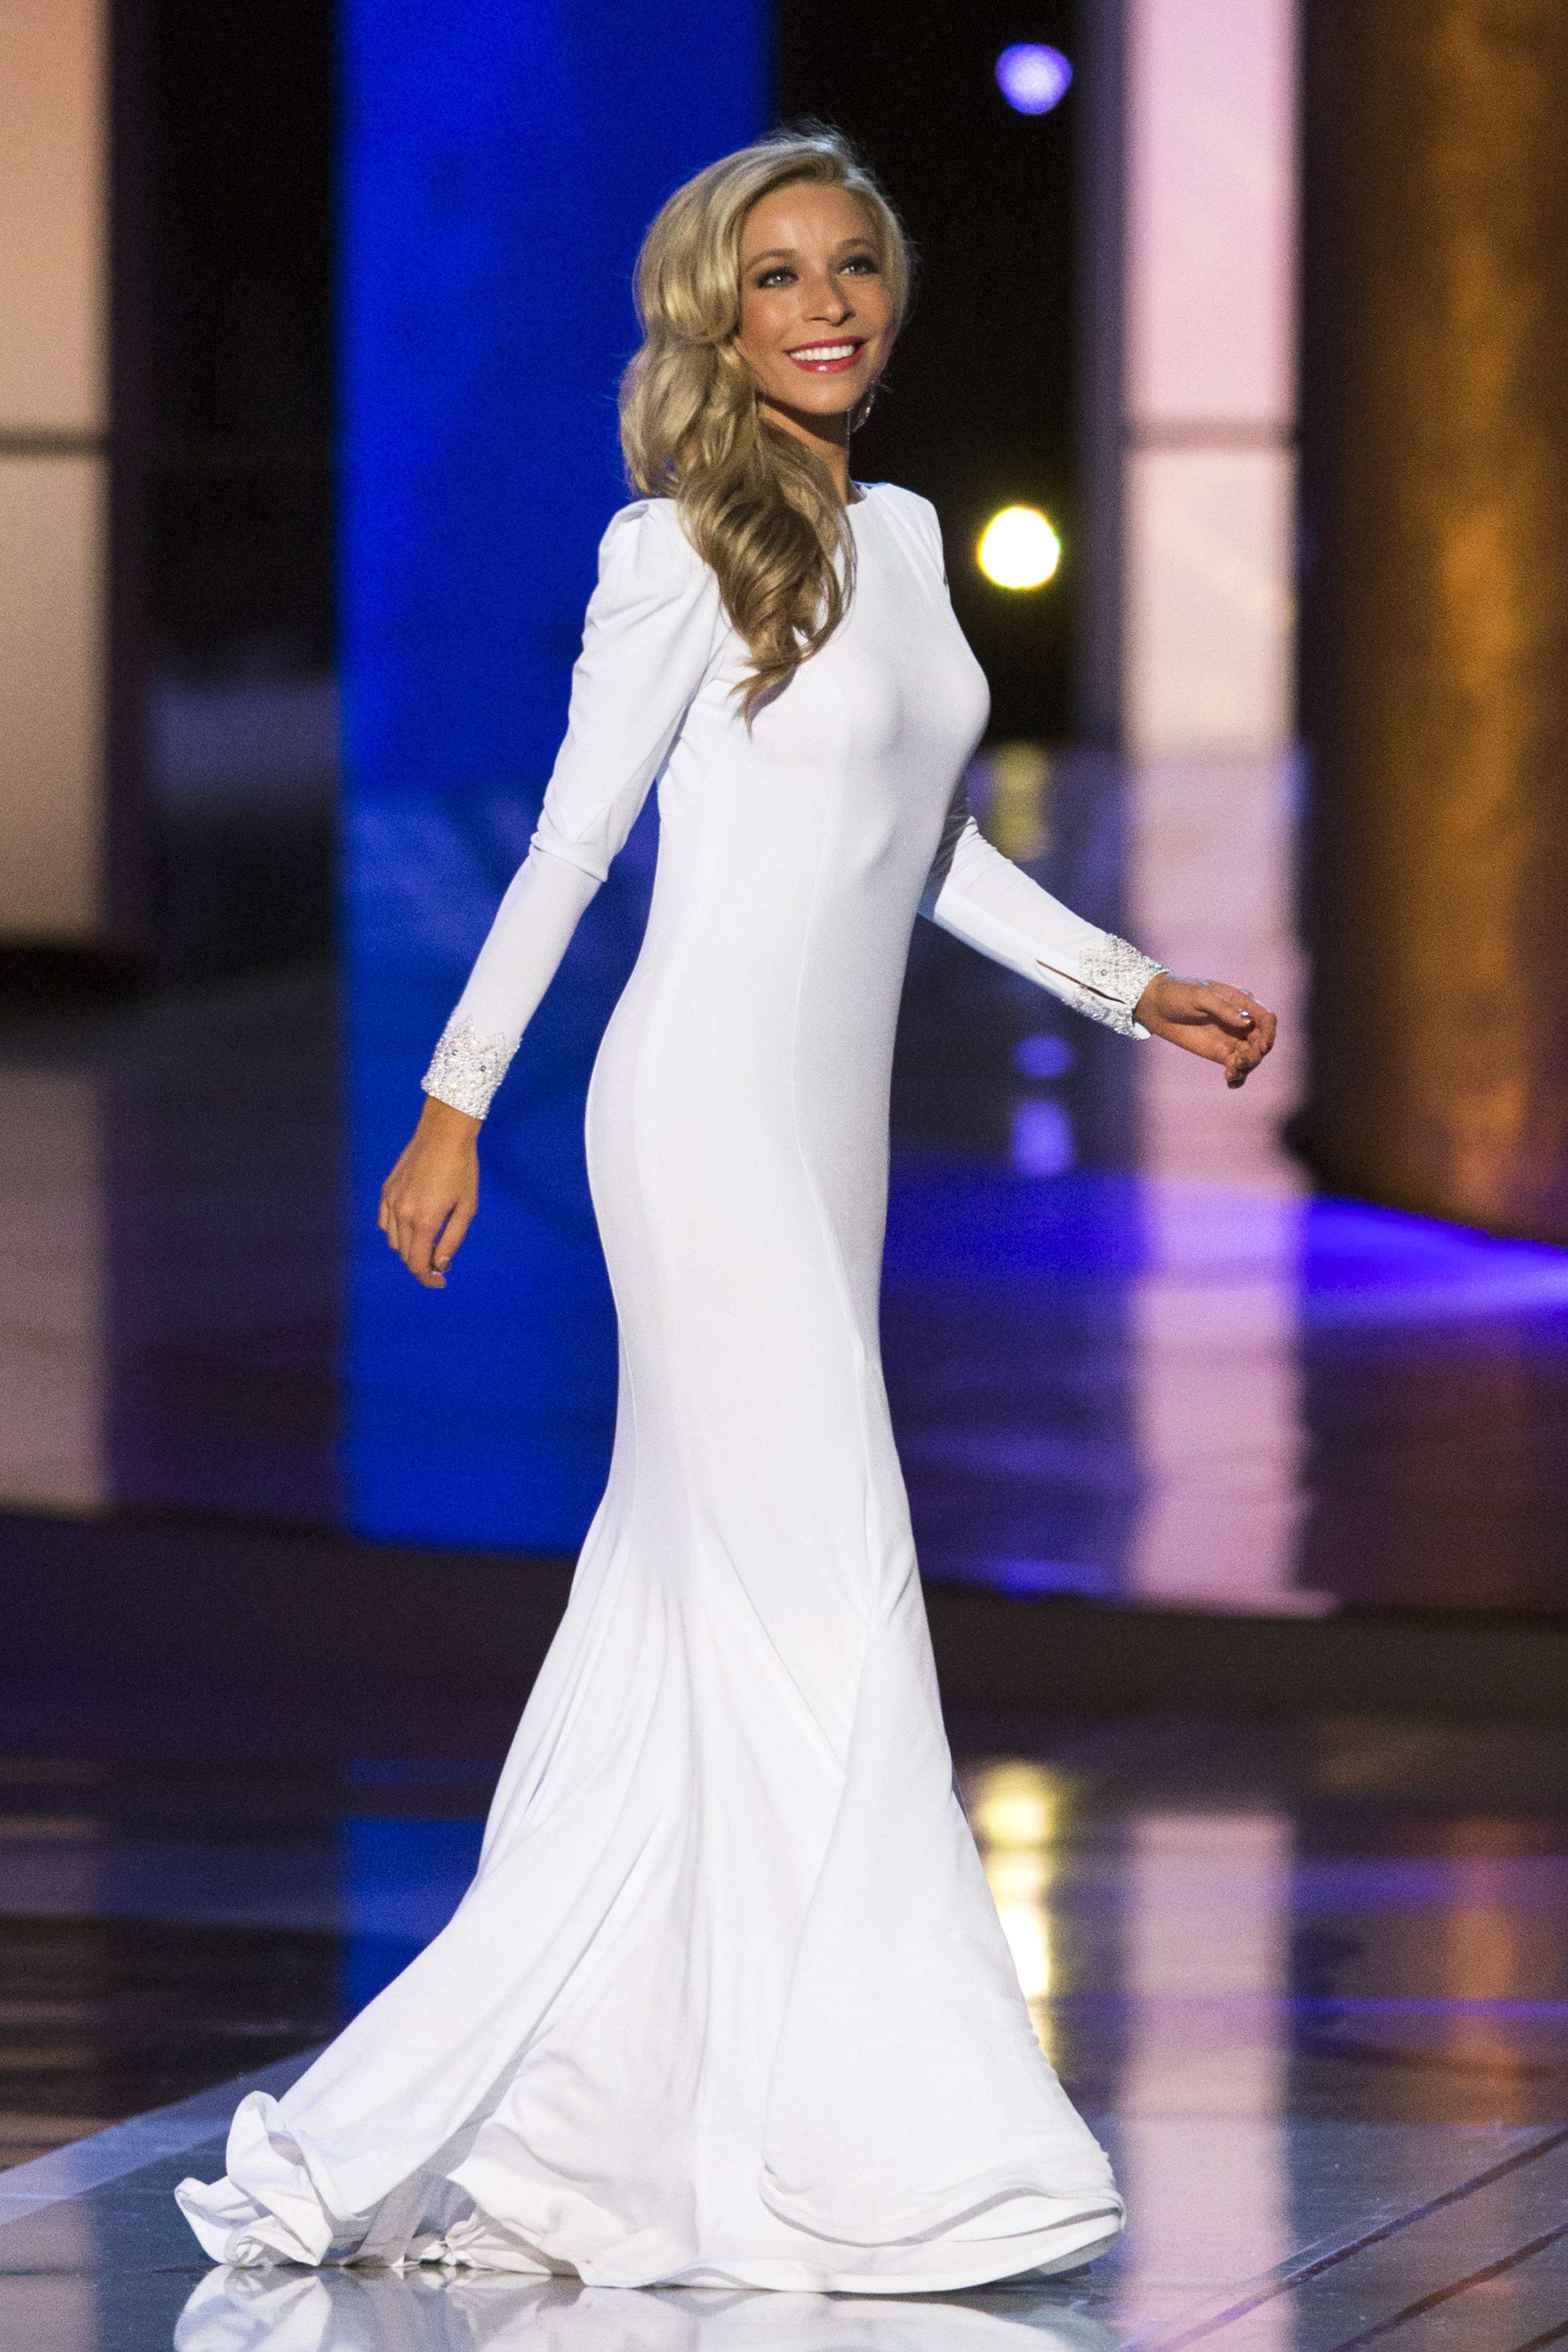 Miss New York Kira Kazantsev sports an evening gown during the final ...